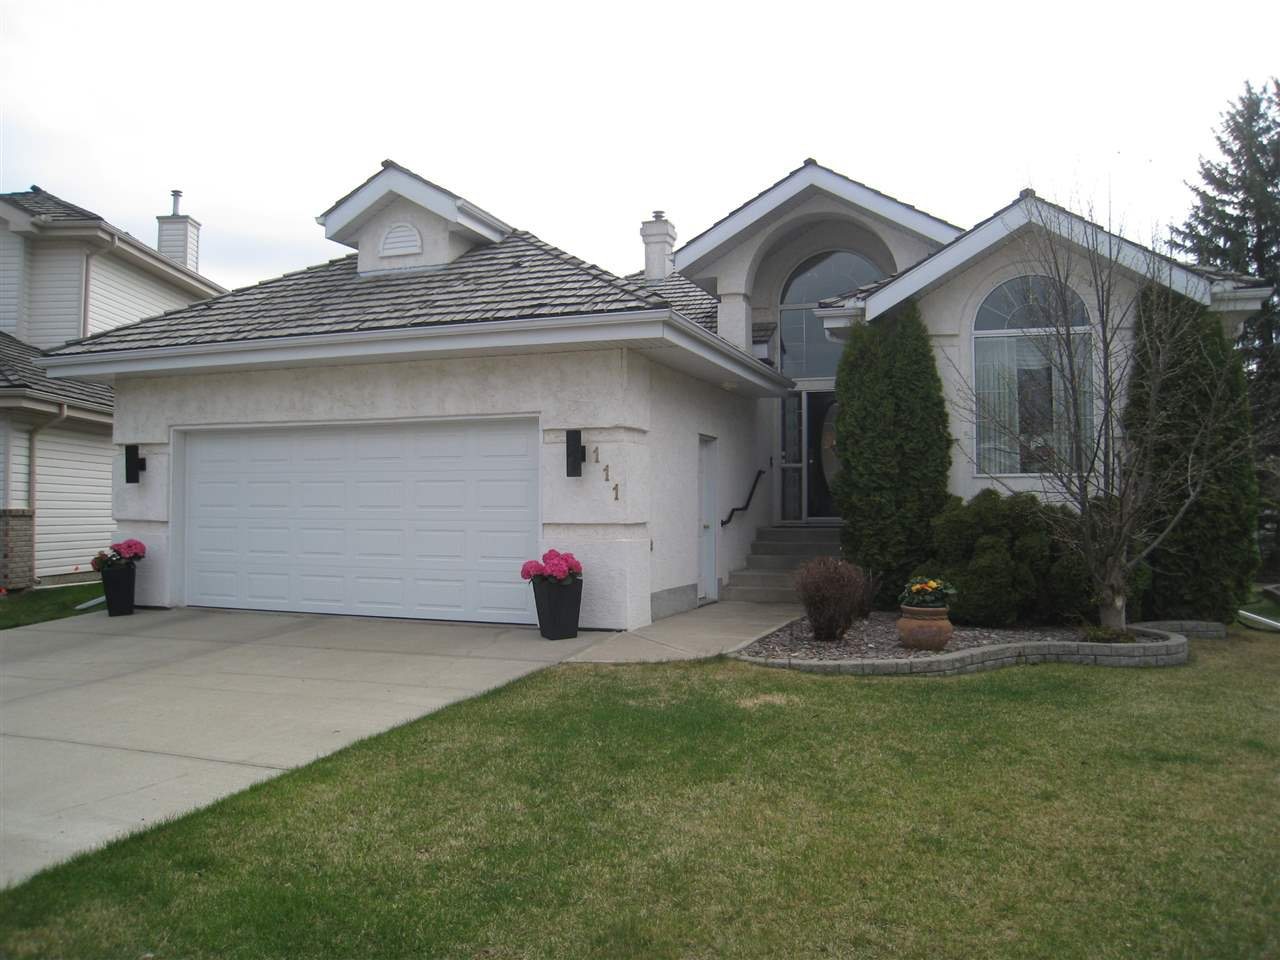 Main Photo: 111 BLACKBURN Drive W in Edmonton: Zone 55 House for sale : MLS®# E4150406